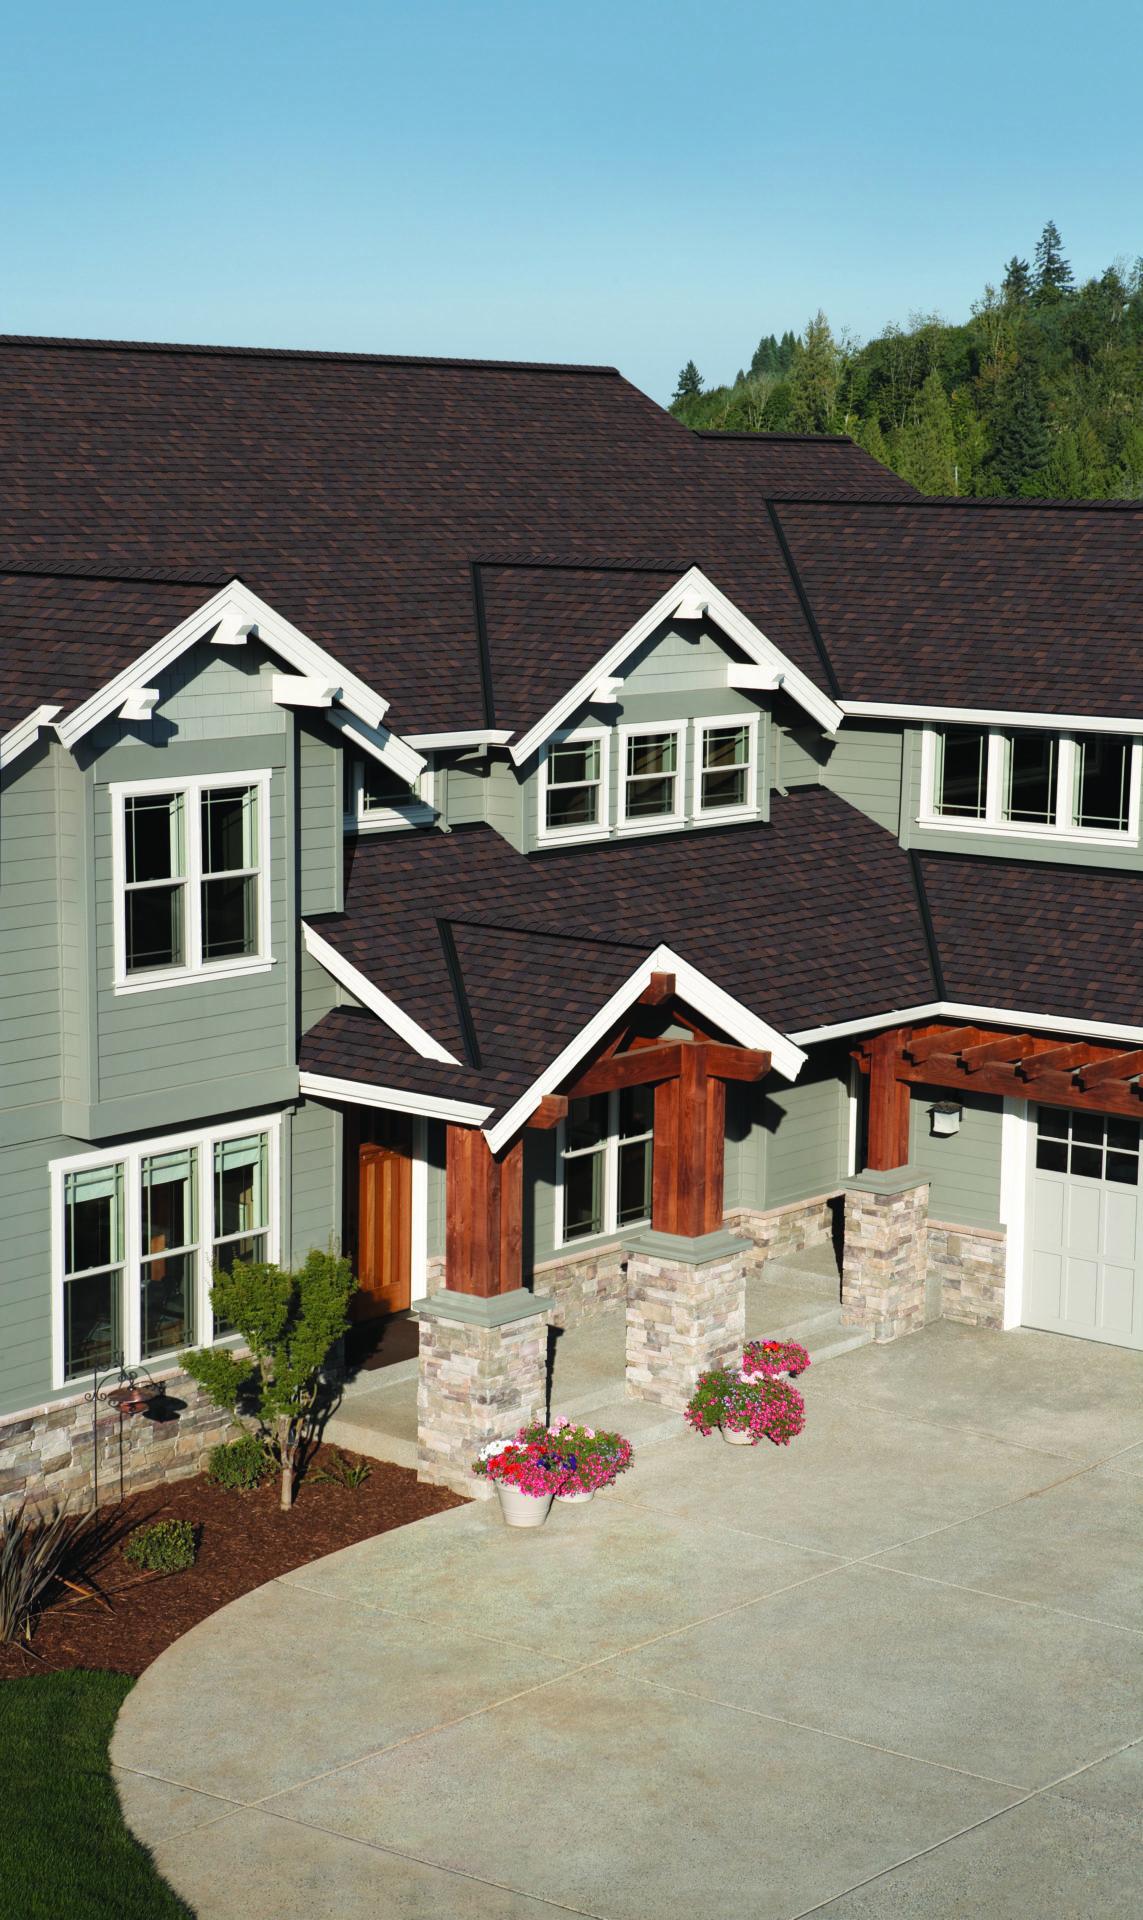 Oc Dp Teak Jpg Brinkmann Quality Roofing Services